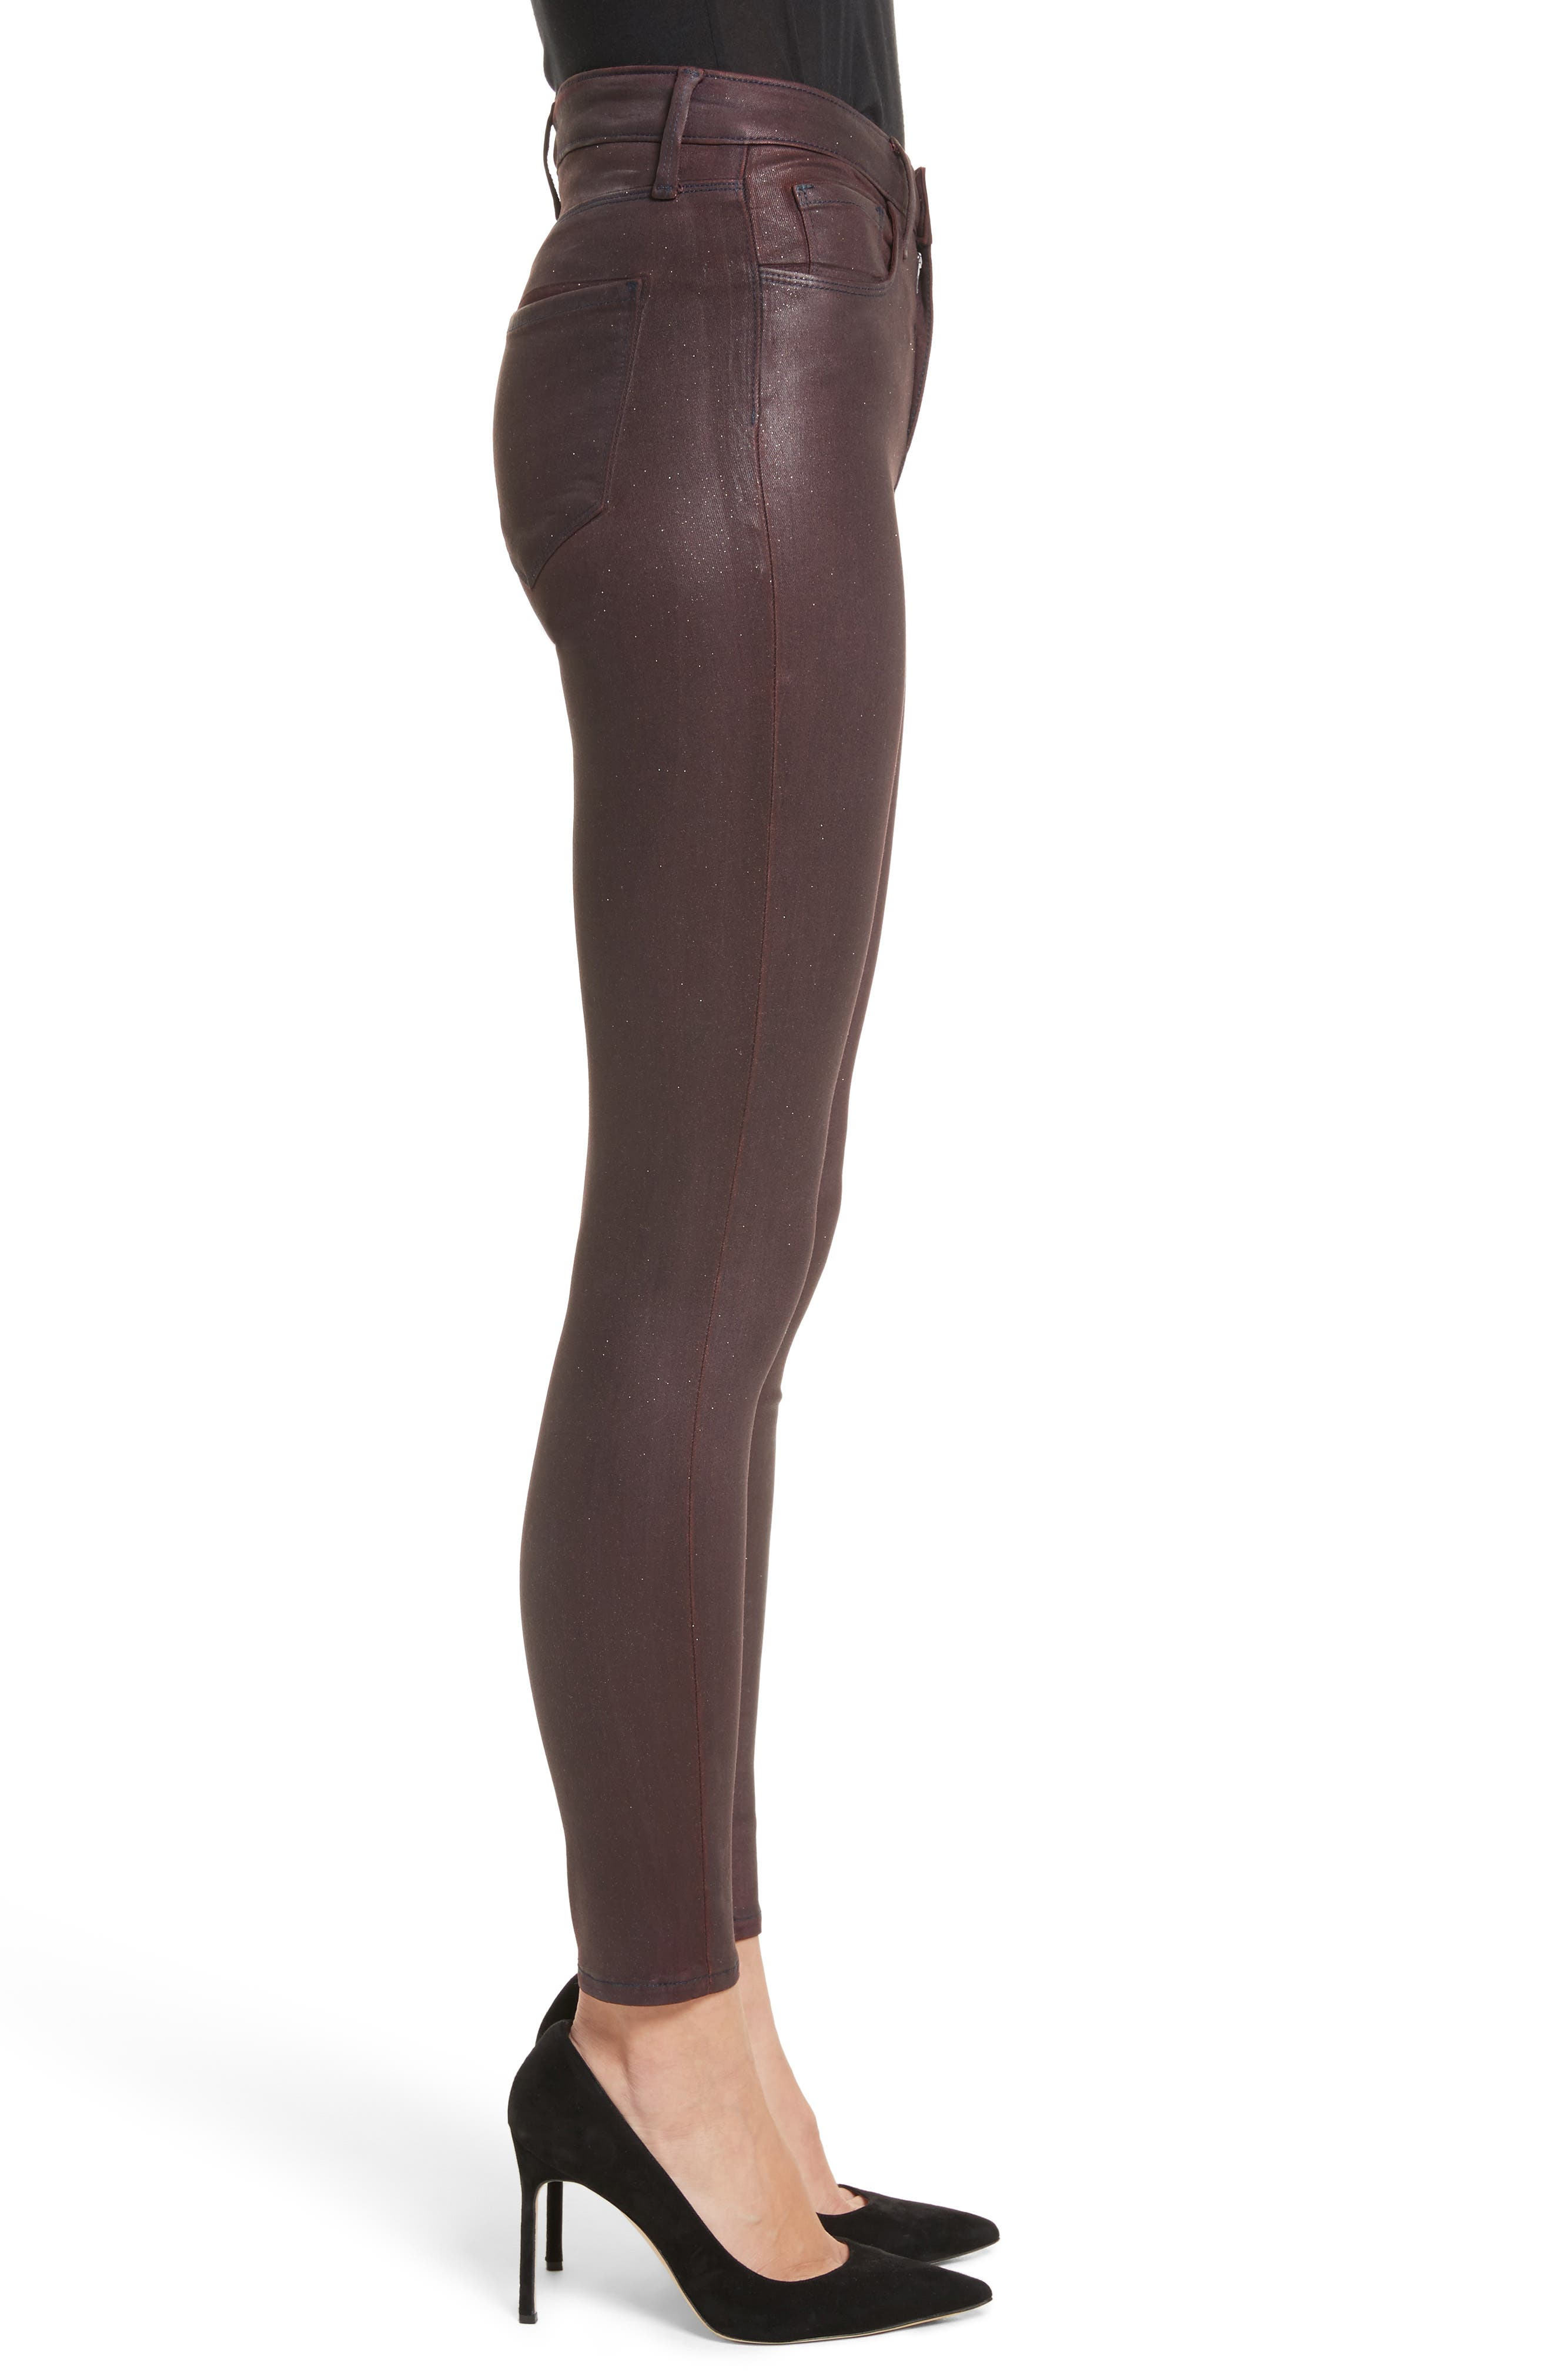 Margot High Waist Glitter Coated Jeans,                             Alternate thumbnail 3, color,                             Bordeaux Glitter Coated